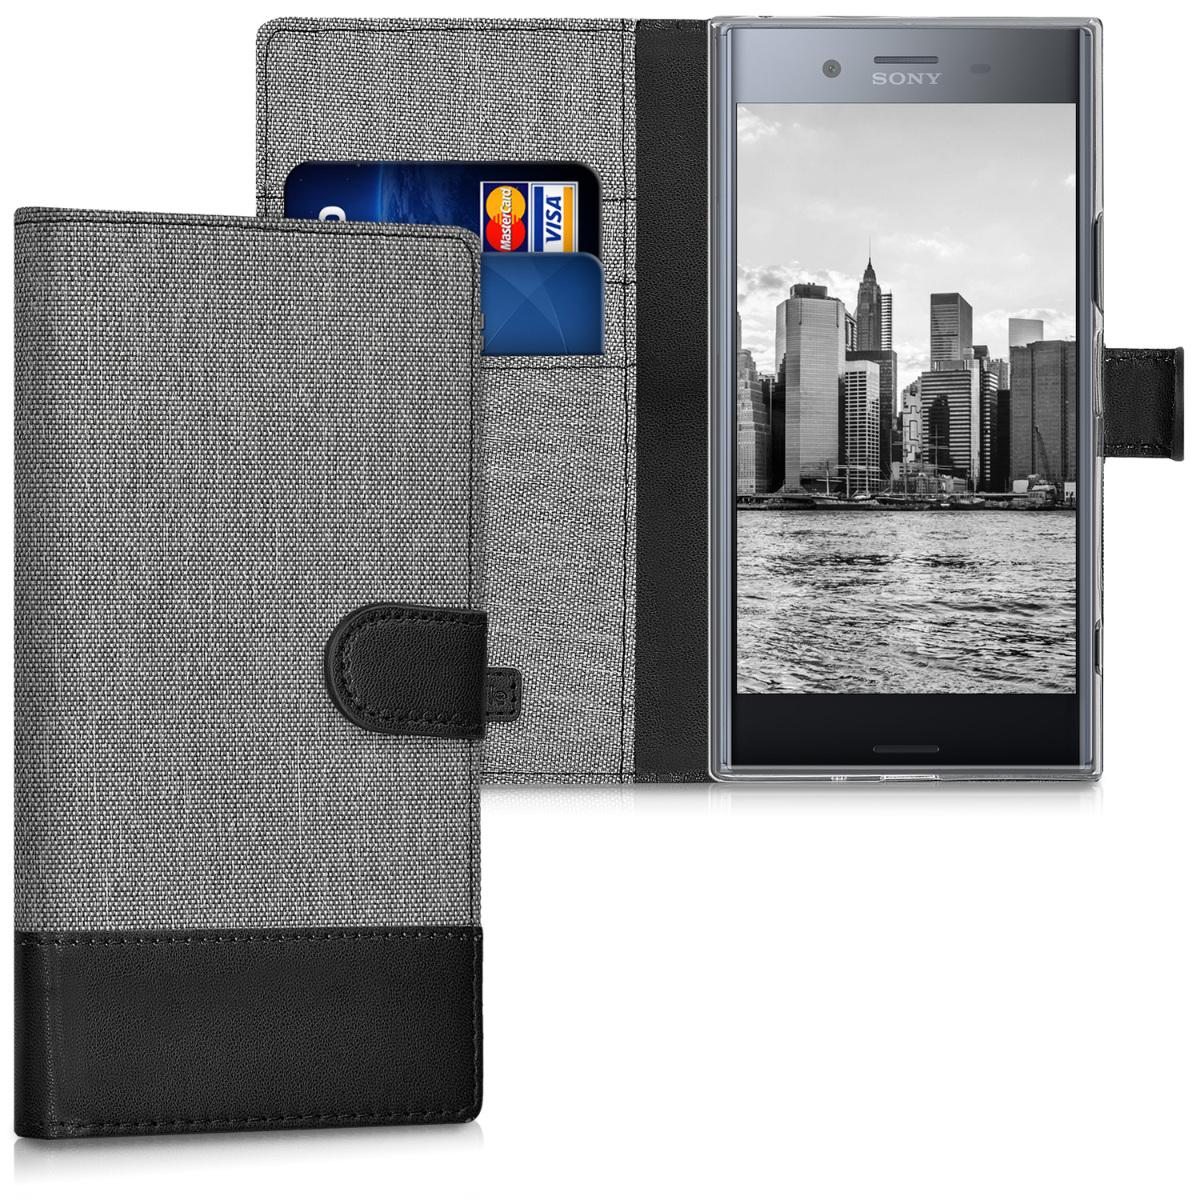 KW Θήκη Πορτοφόλι Sony Xperia XZ Premium - Συνθετικό δέρμα - Grey / Black (41200.01)